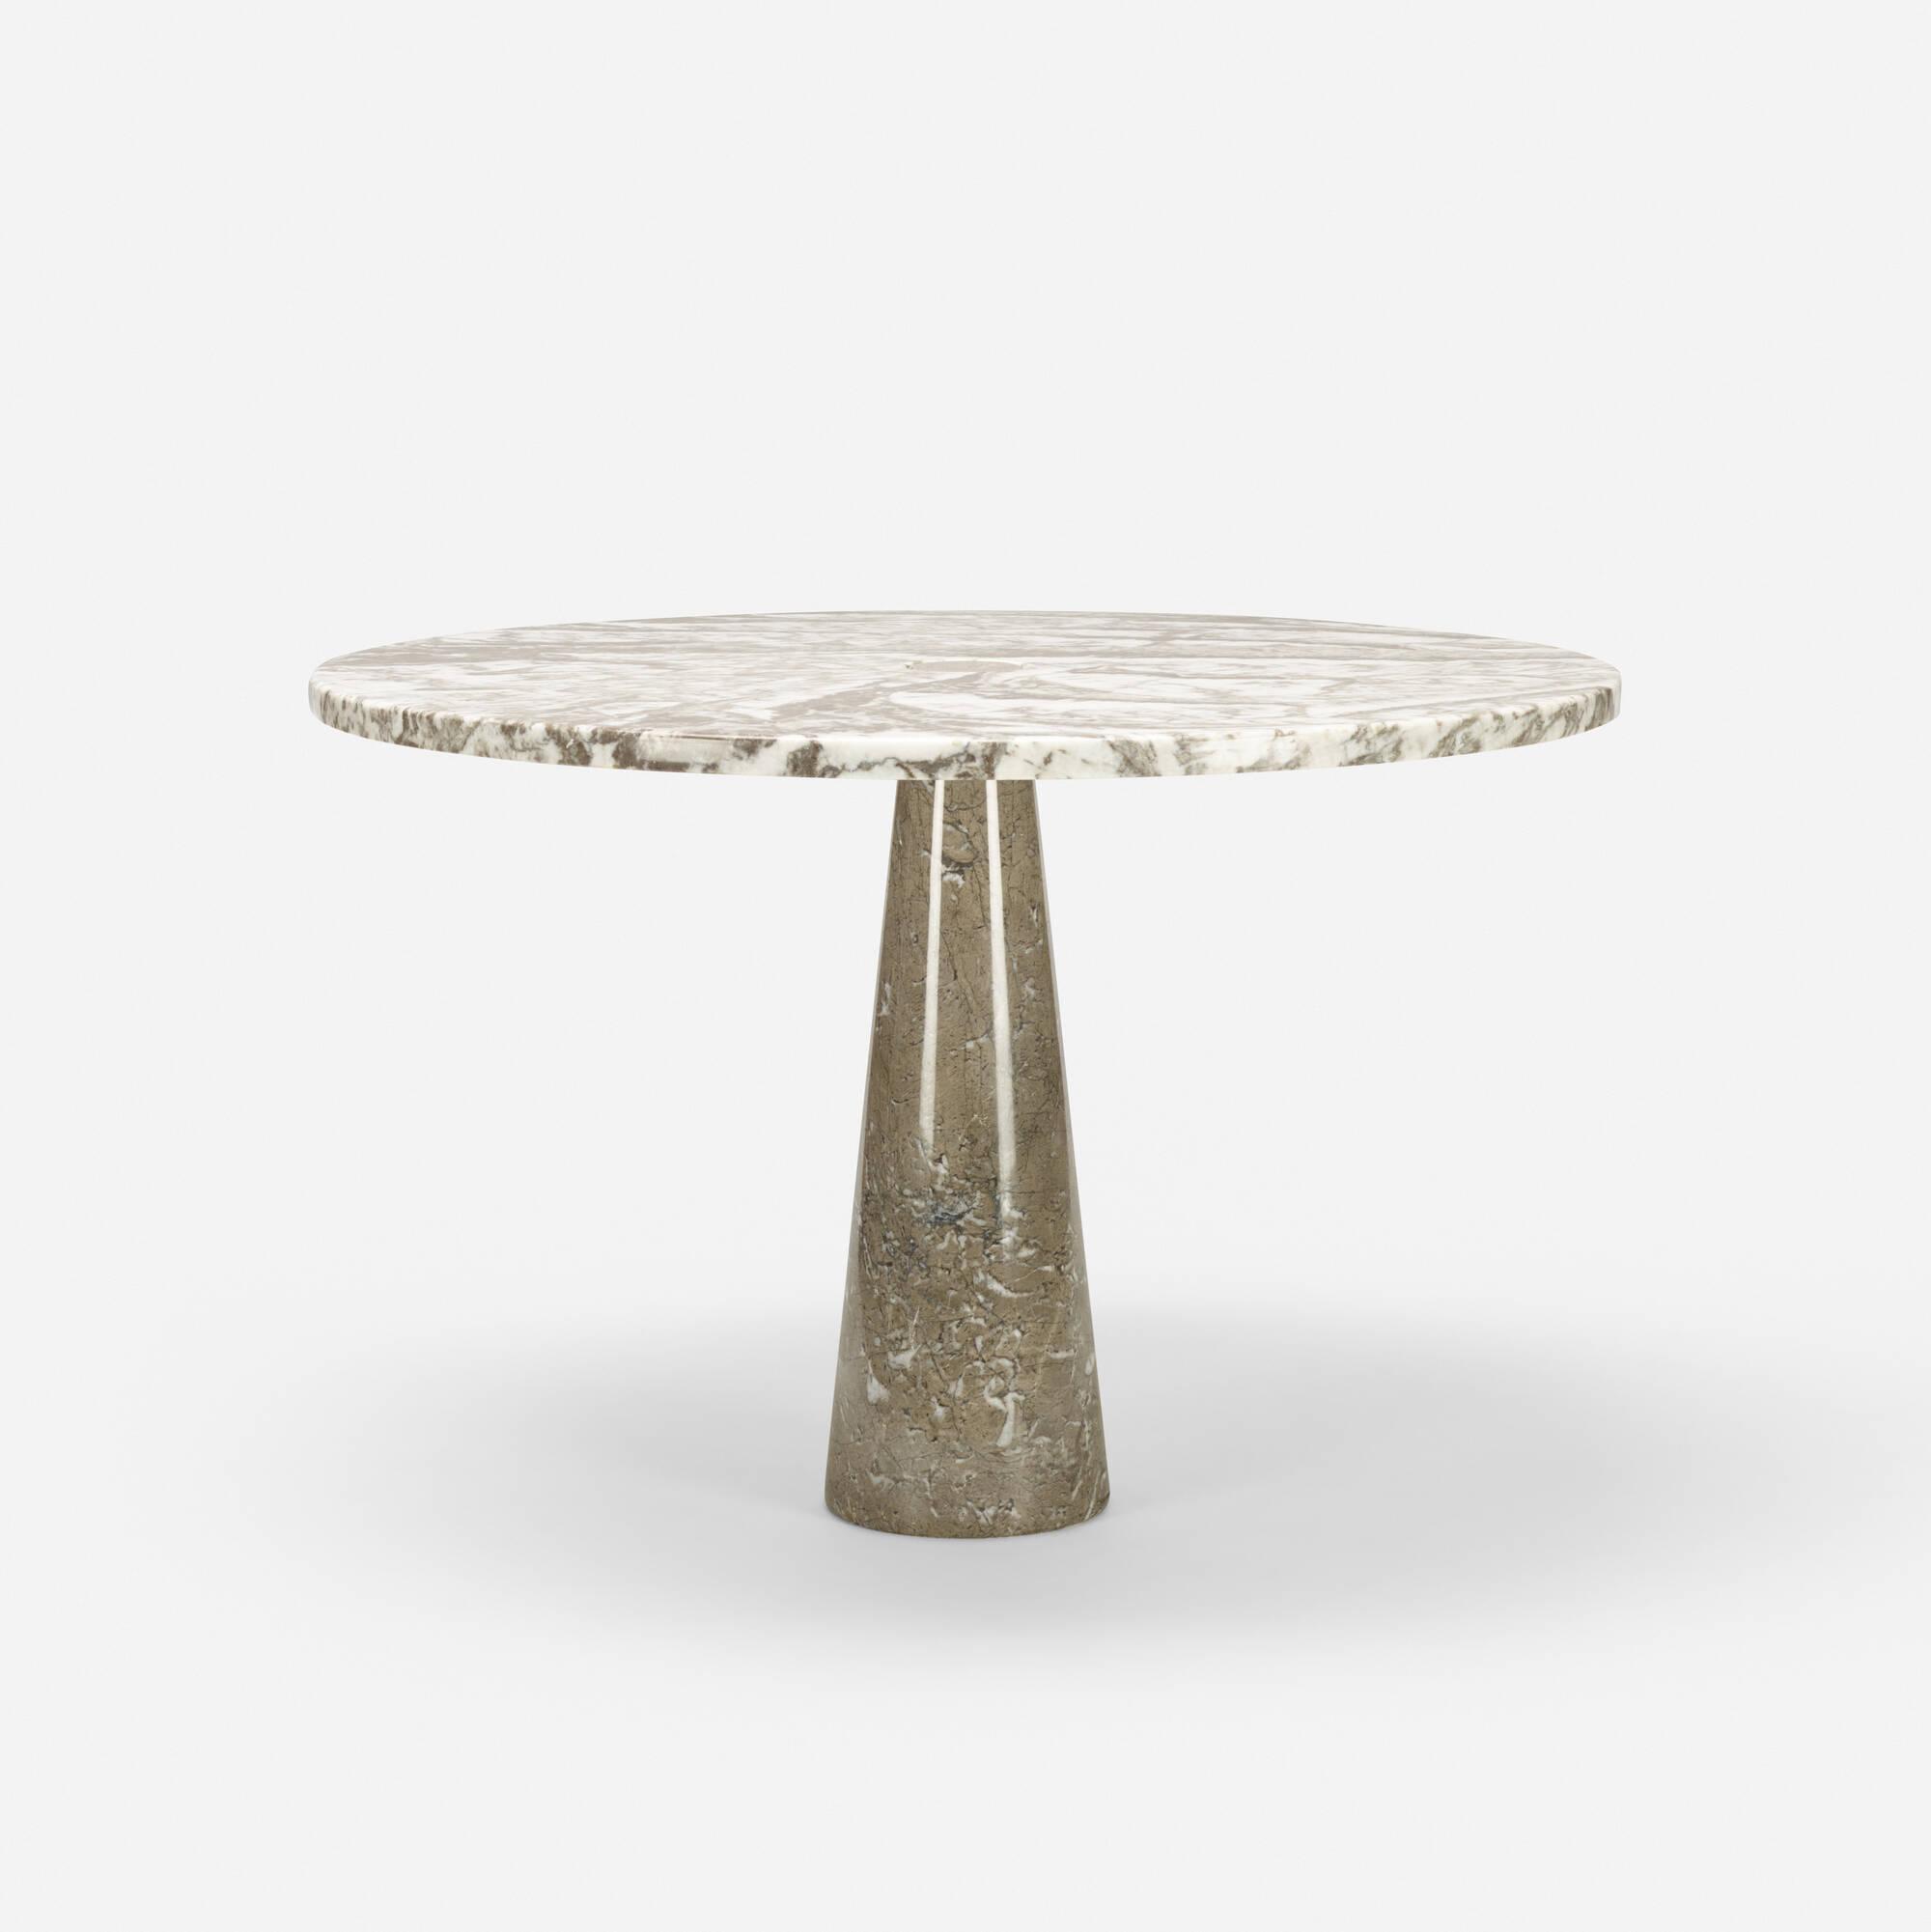 311: Angelo Mangiarotti / Eros dining table (1 of 2)